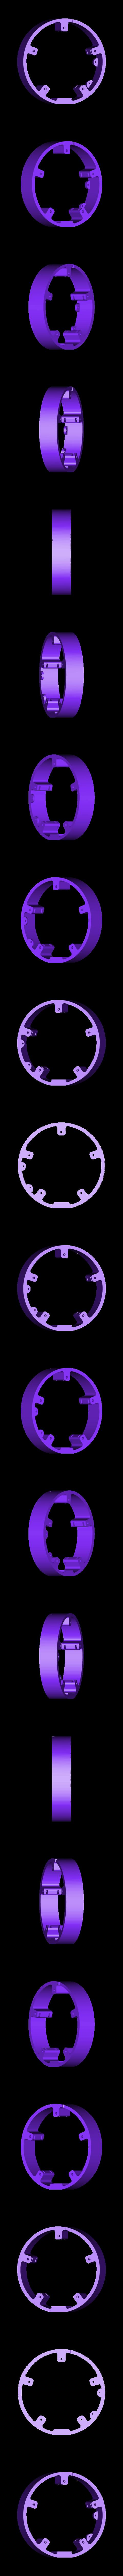 Base.stl Télécharger fichier STL Gyro Winder / Watch Winder / Remontoir Montre • Objet pour impression 3D, NedalLive